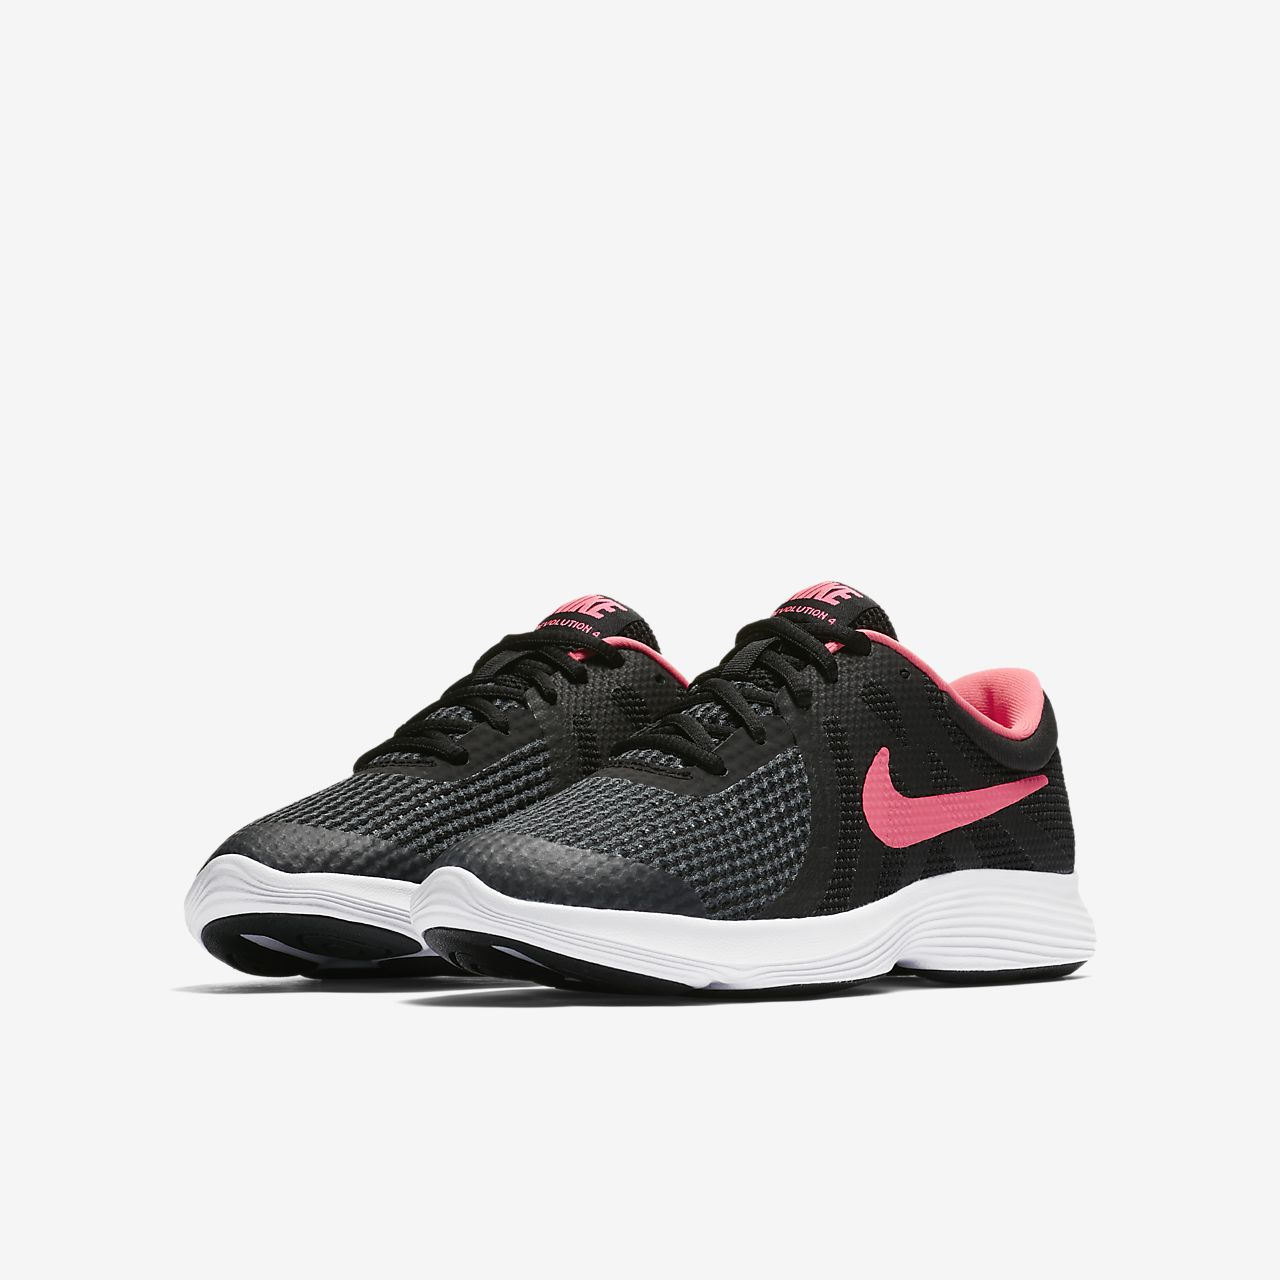 fa77cc46251 Nike Revolution 4 Older Kids  Running Shoe. Nike.com GB